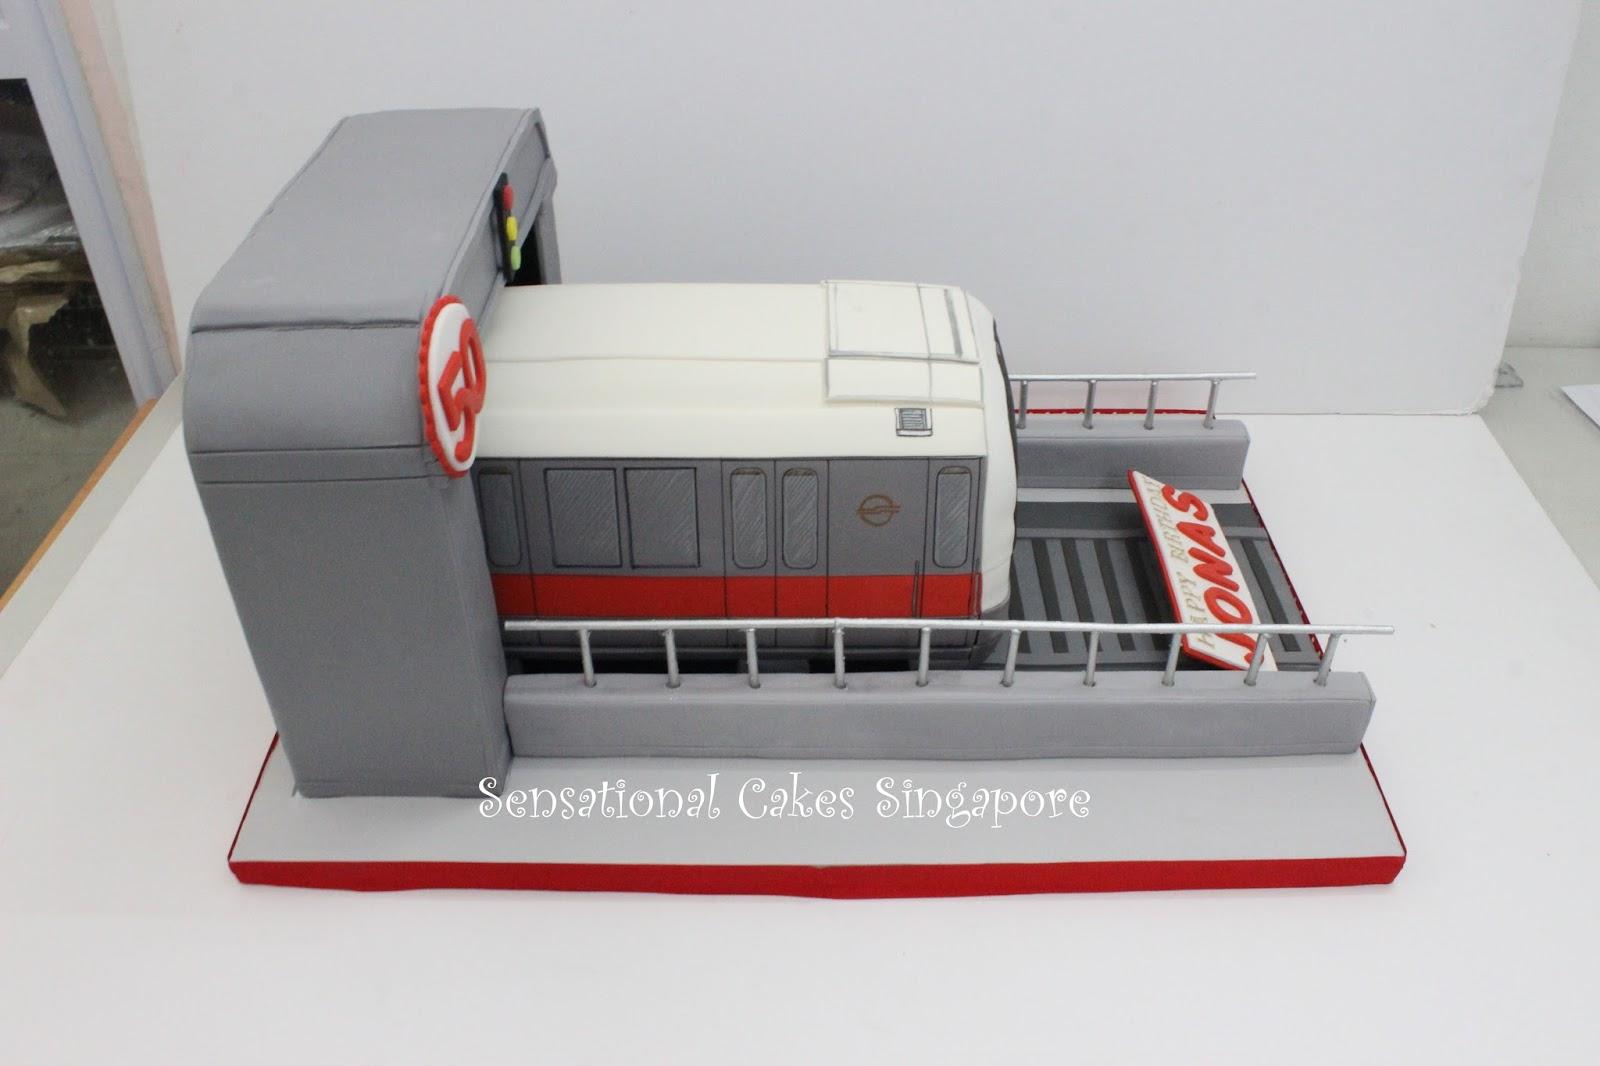 The Sensational Cakes Spectacular Smrt Train Transport